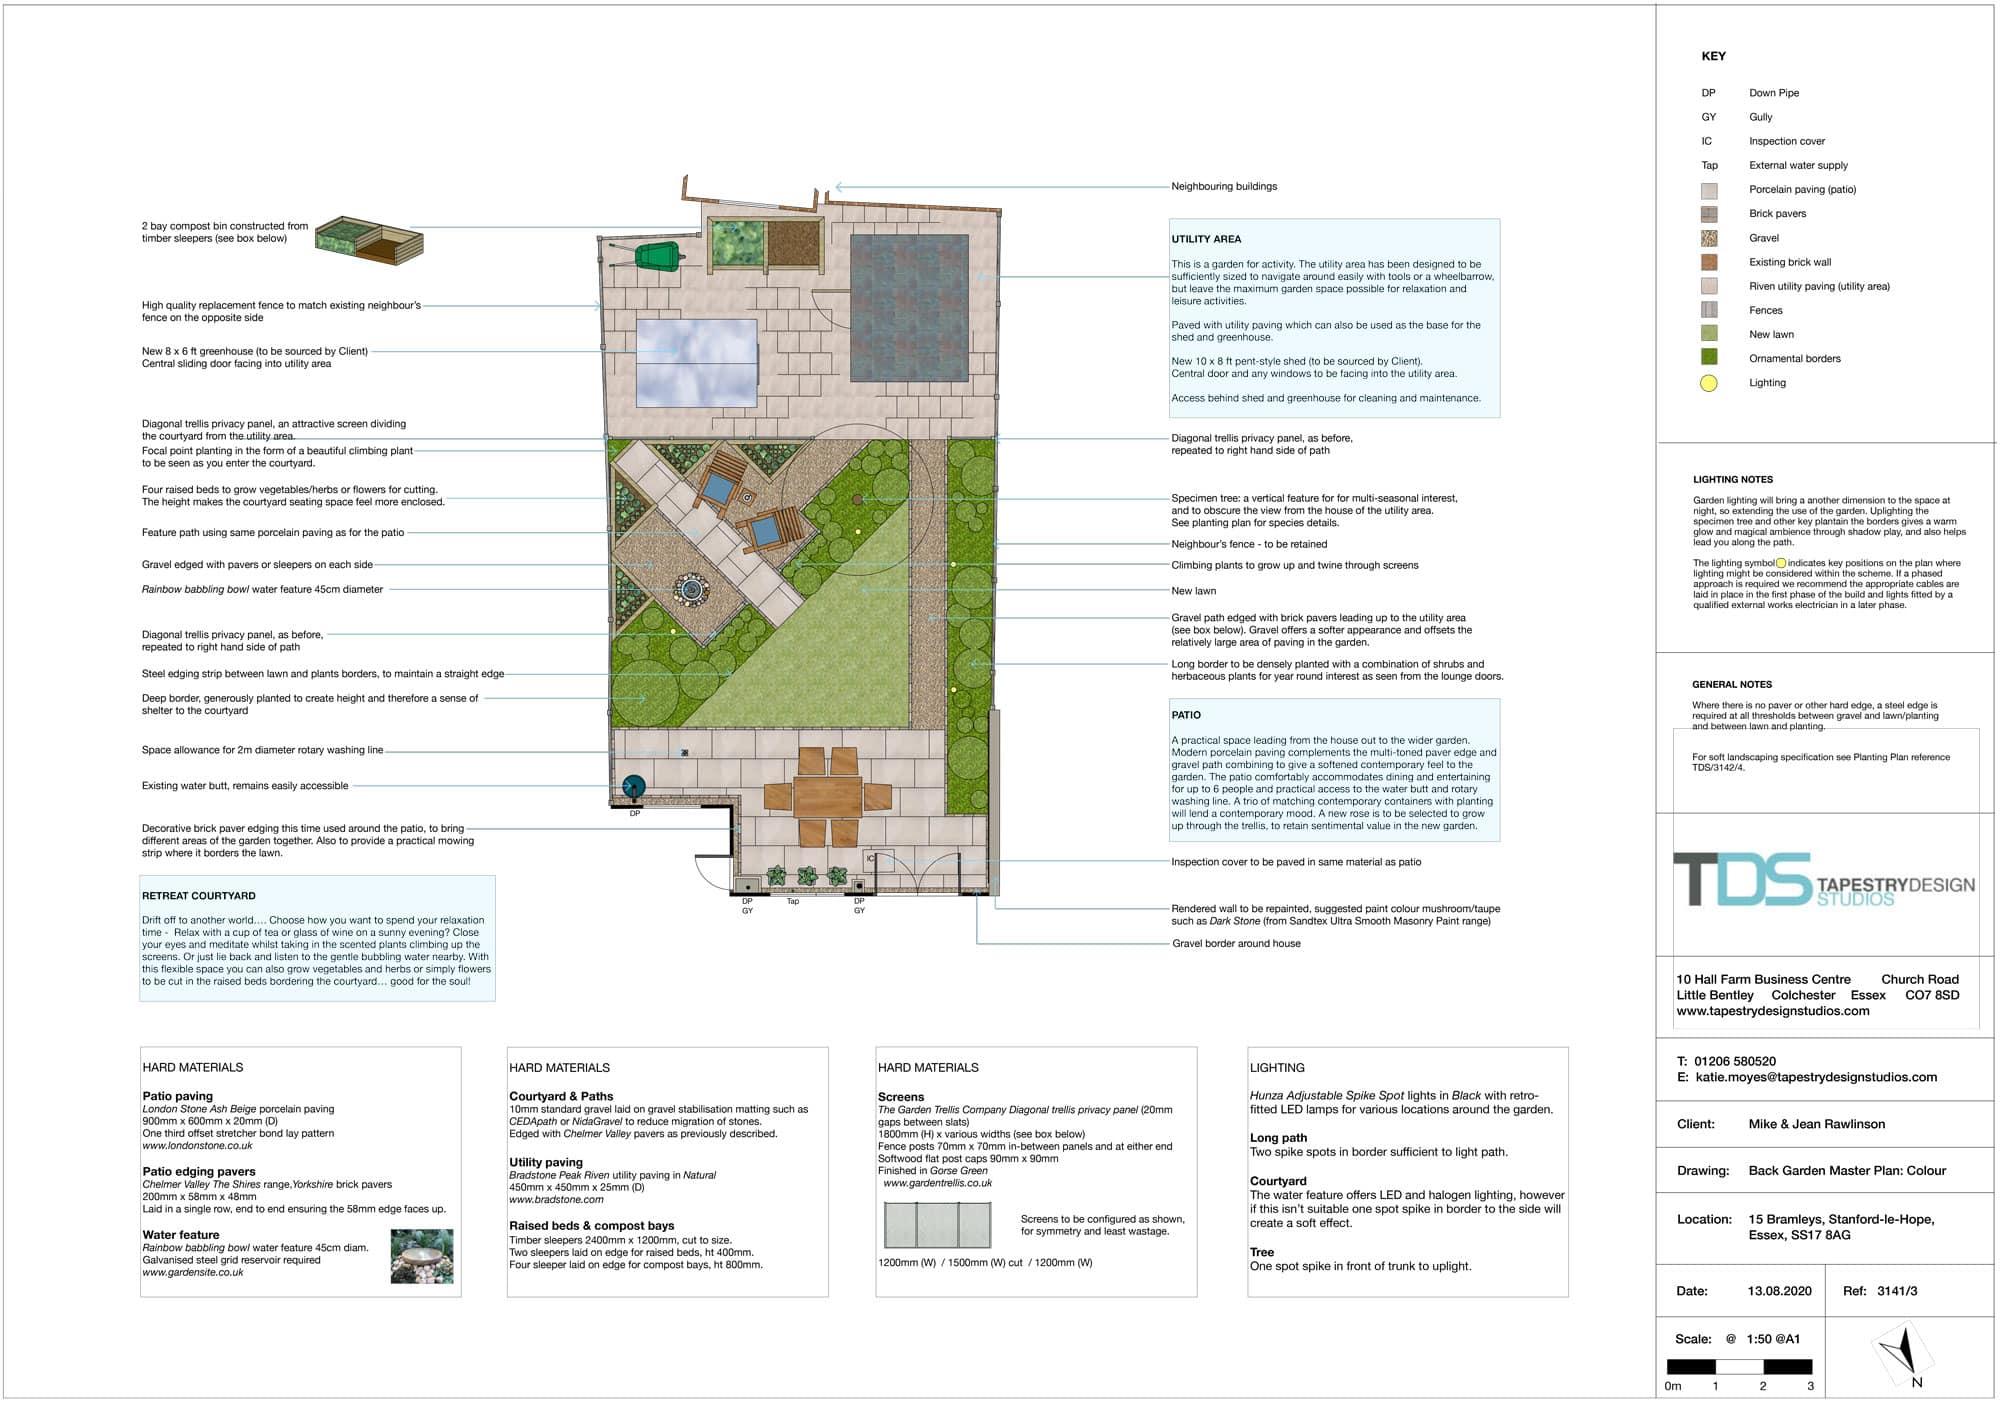 garden layout plan for rear garden design